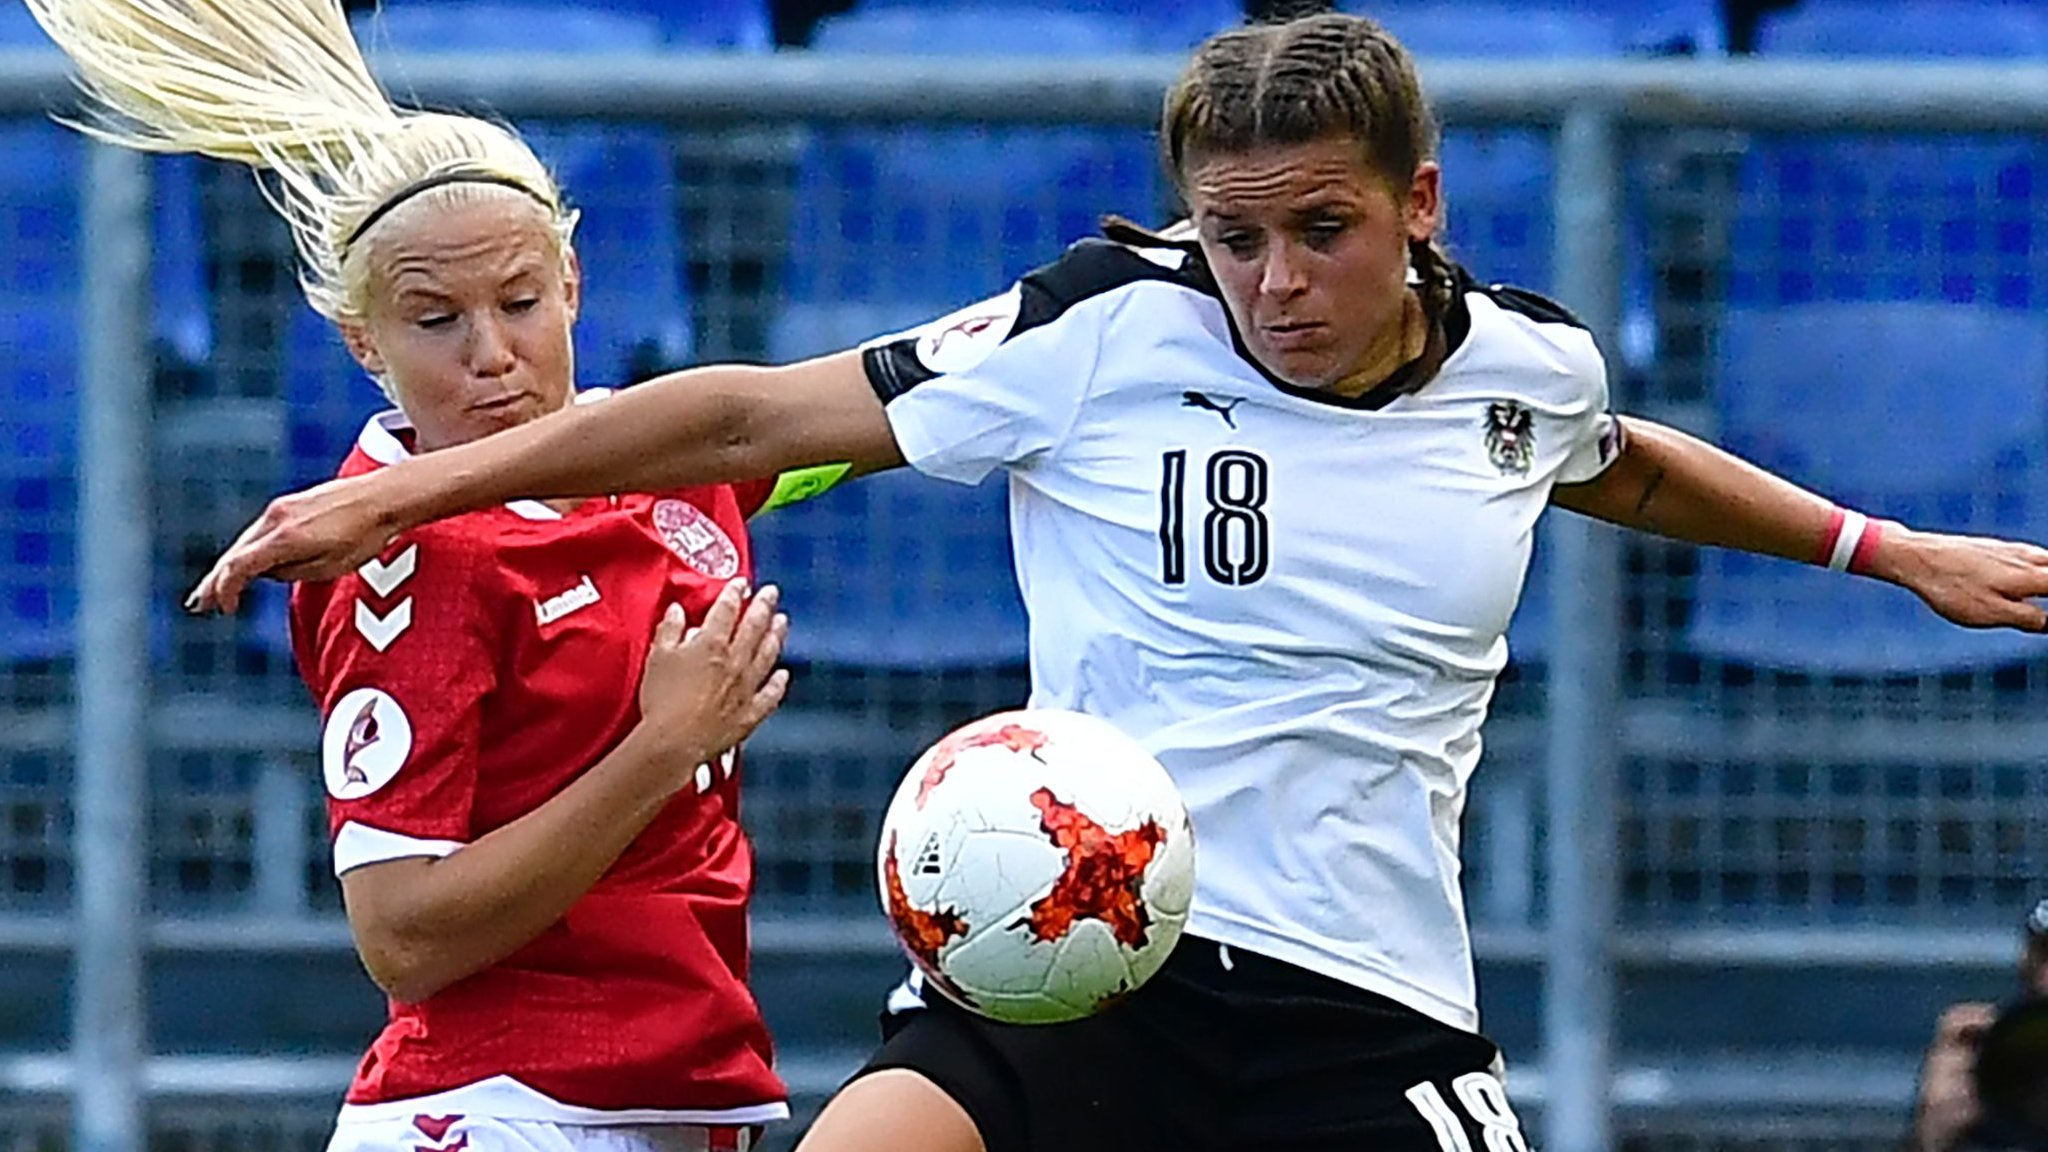 Denmark reach Women's Euro 2017 final